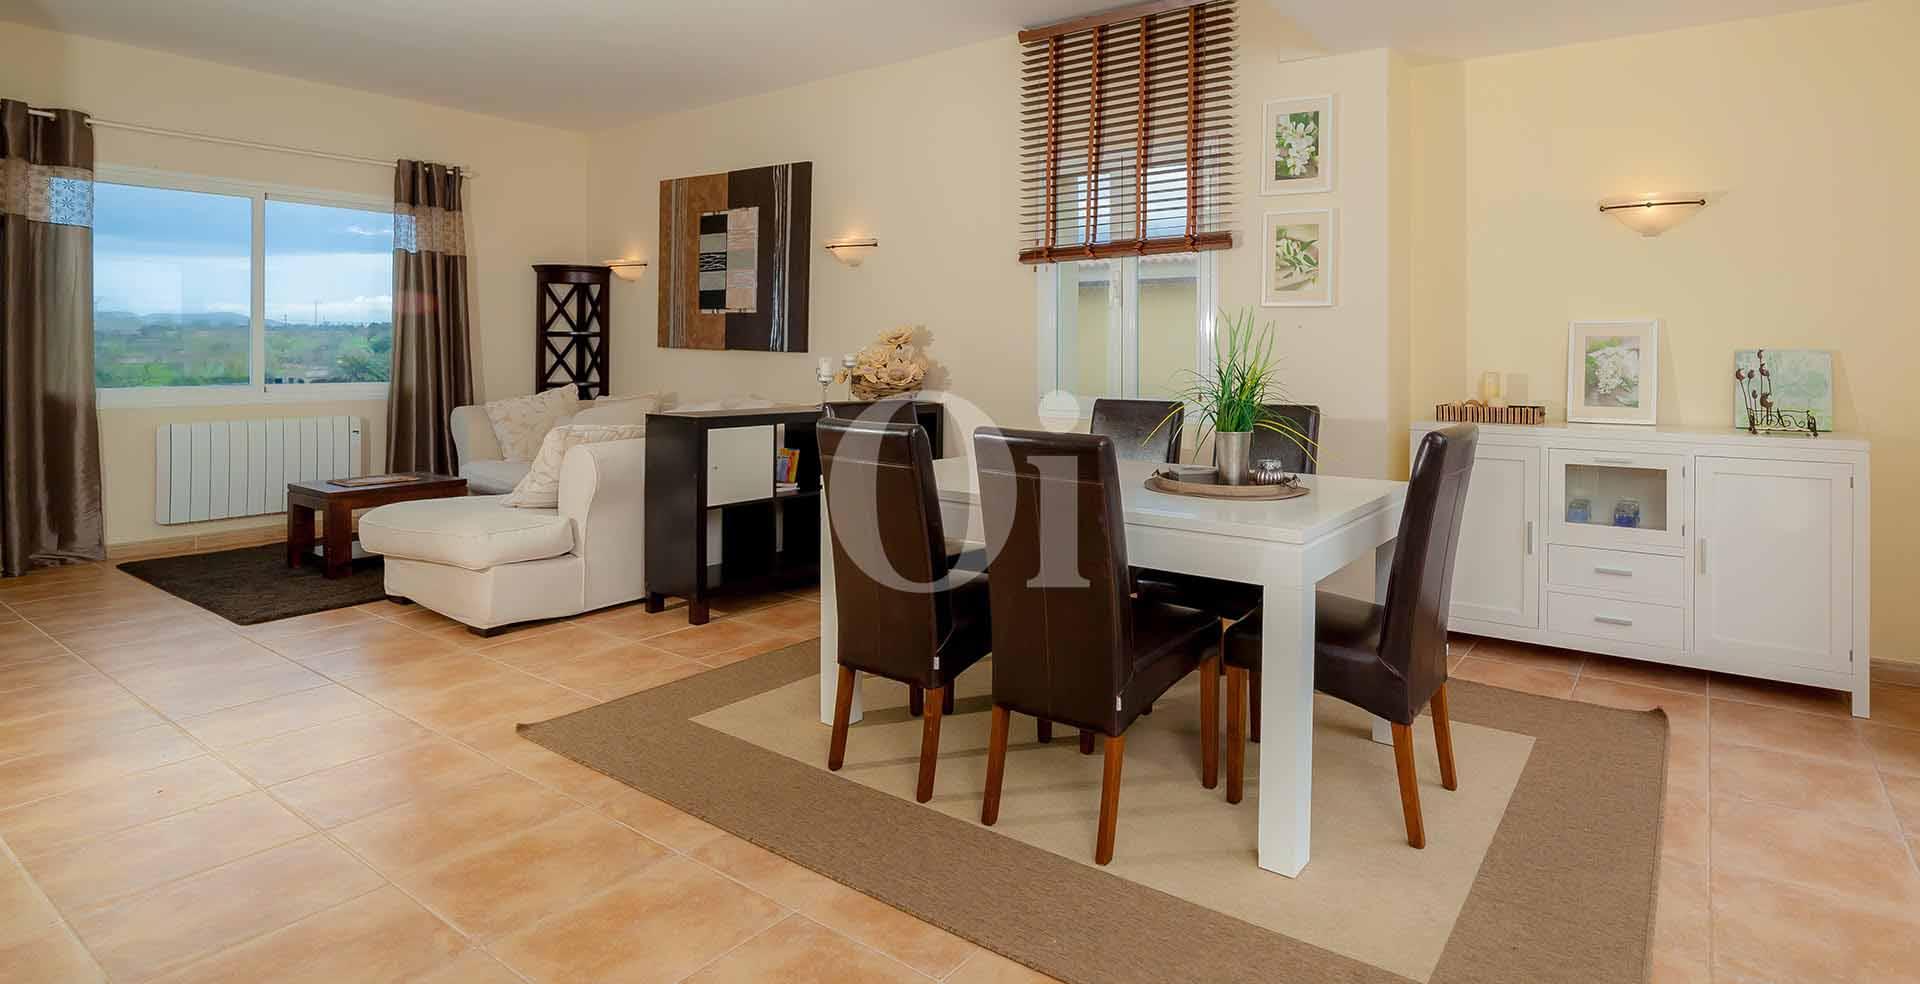 Salón-comedor de apartamento nuevo en venta en Porto Cristo, Mallorca